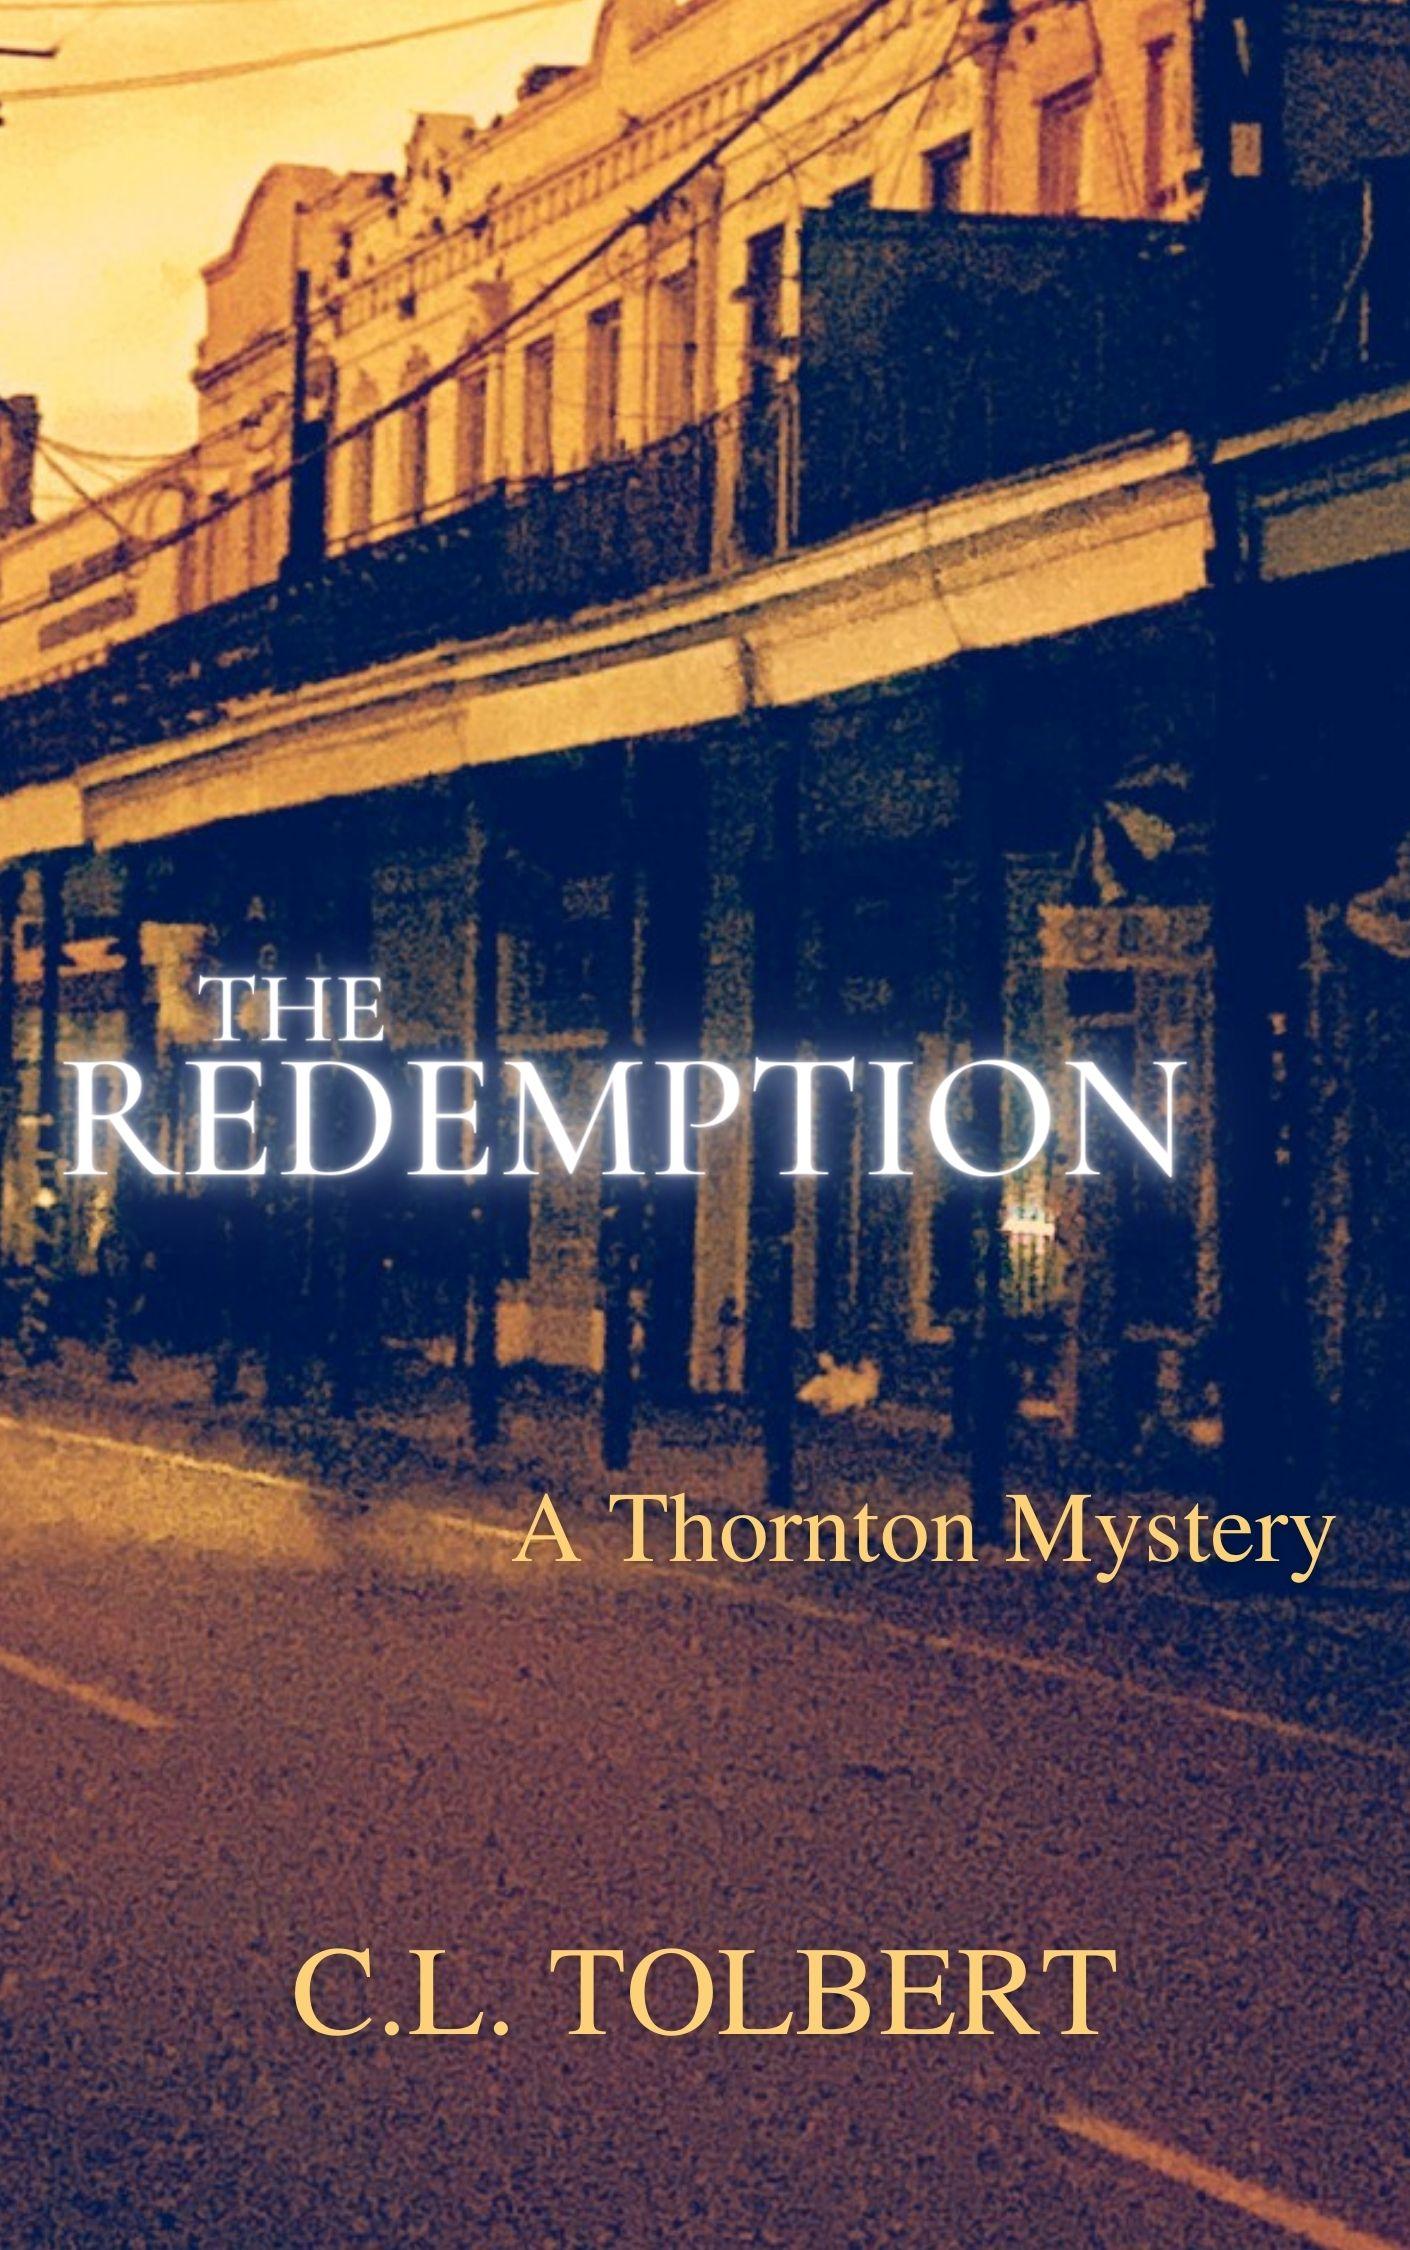 THE REDEMPTION - CLTolbert